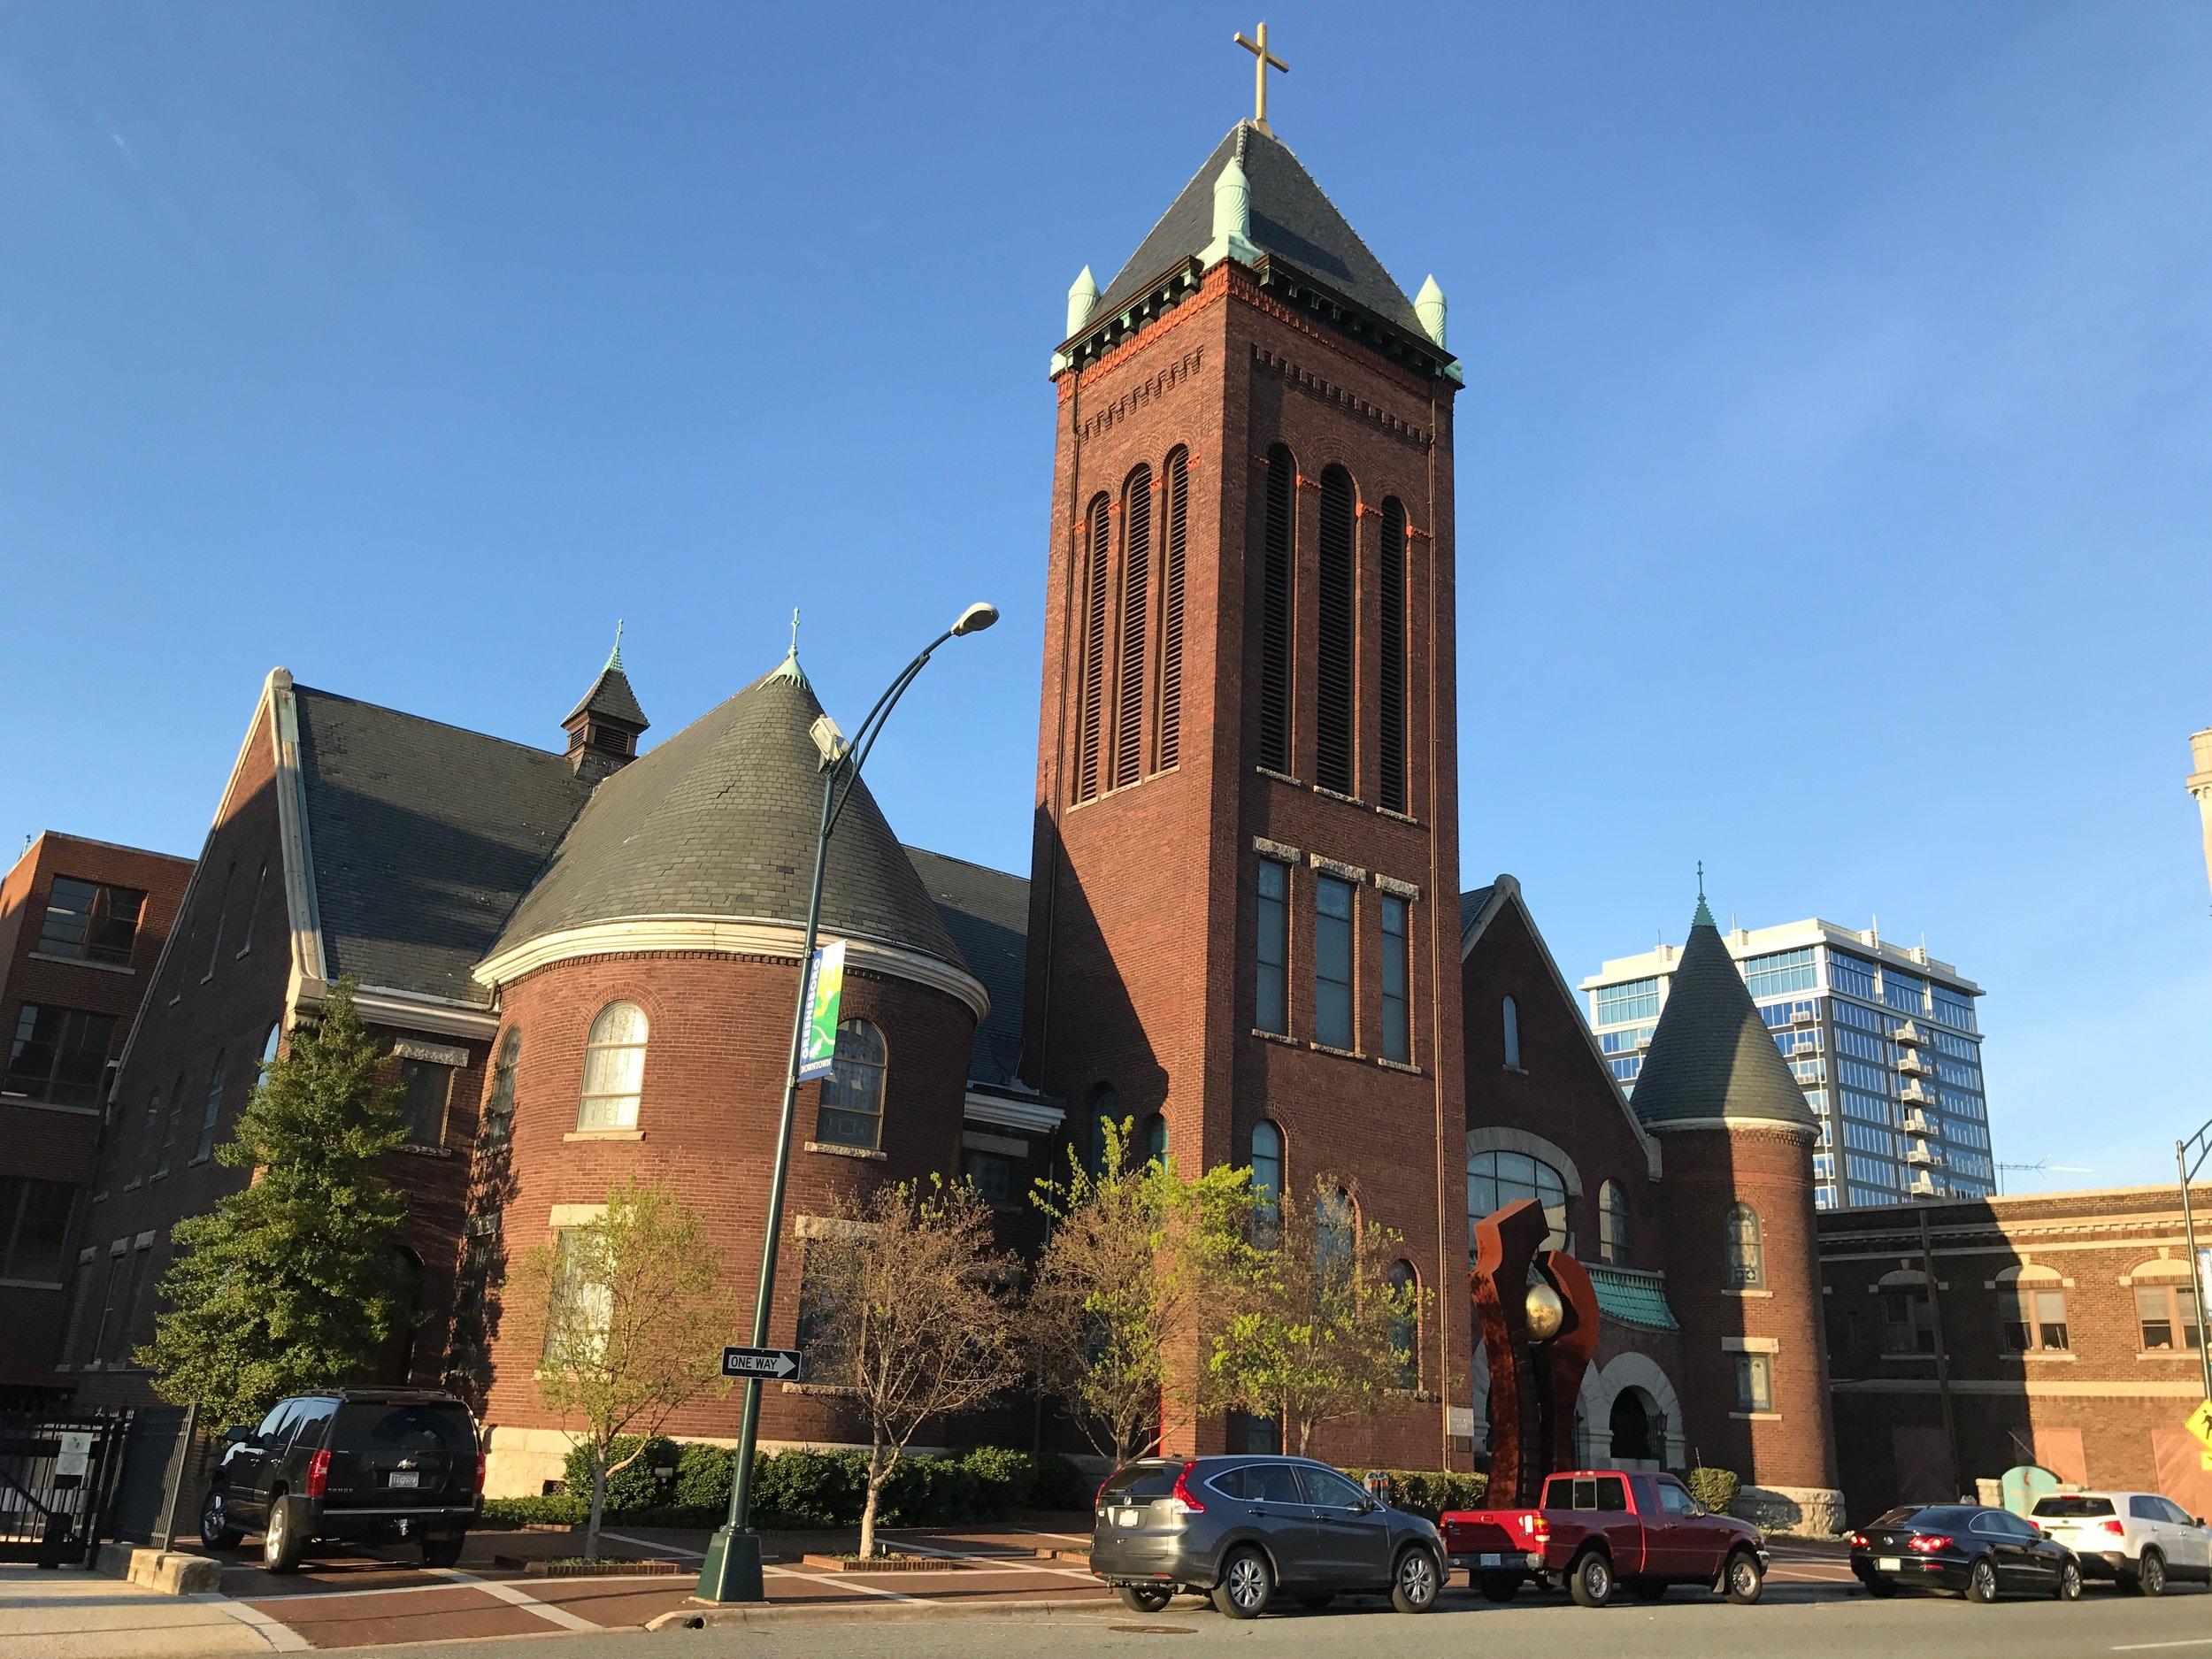 West Market Church - A United Methodist Congregation302 West Market St. | Greensboro, NC 27401 | 336-275-4587